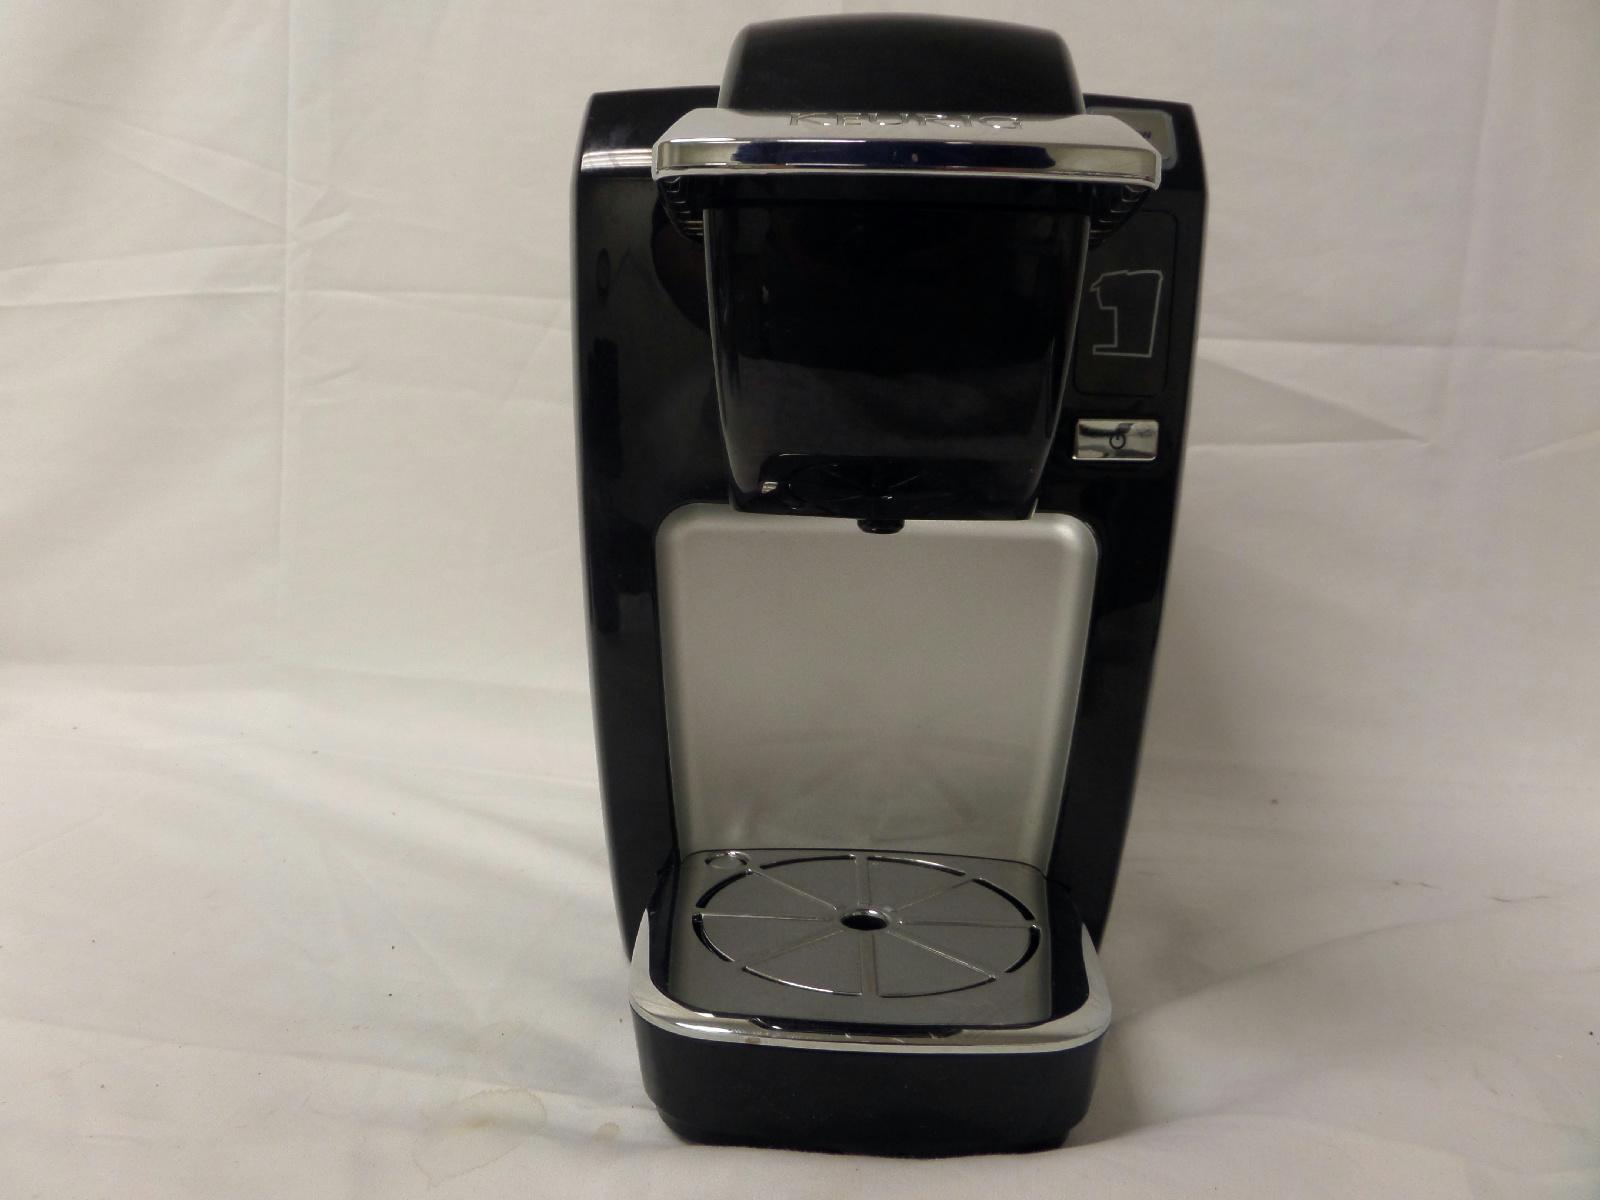 Keurig B31 Coffee Maker Mini Plus Brewing System Black eBay